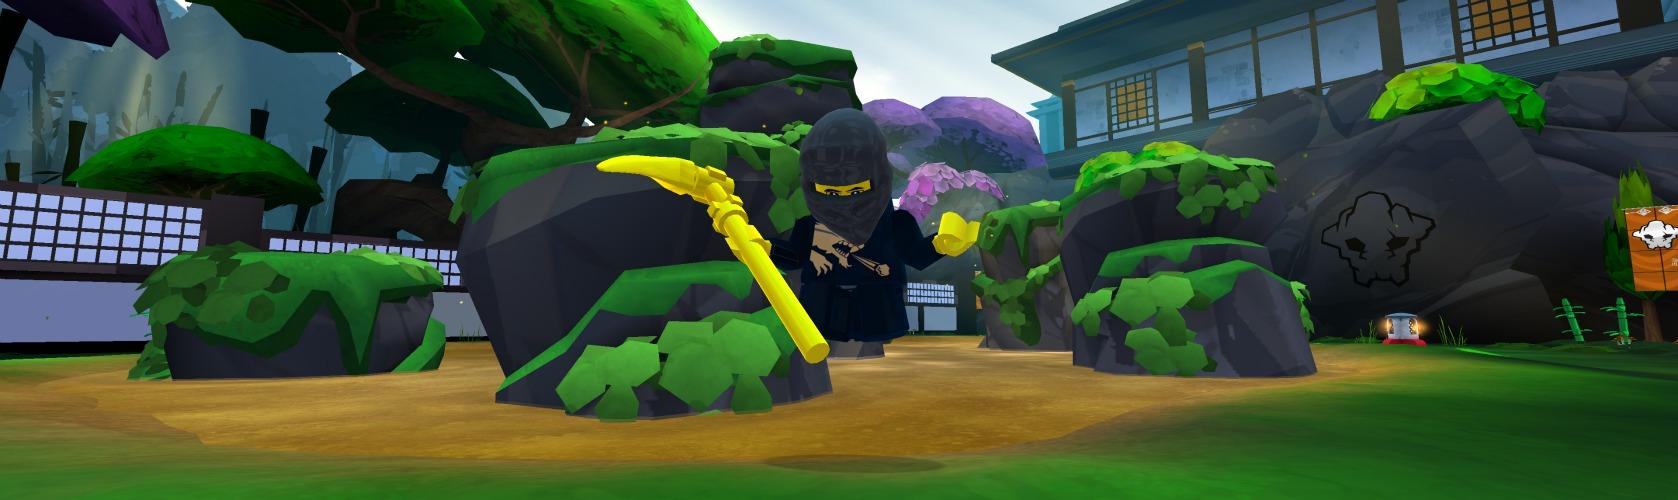 2 player ninjago games online